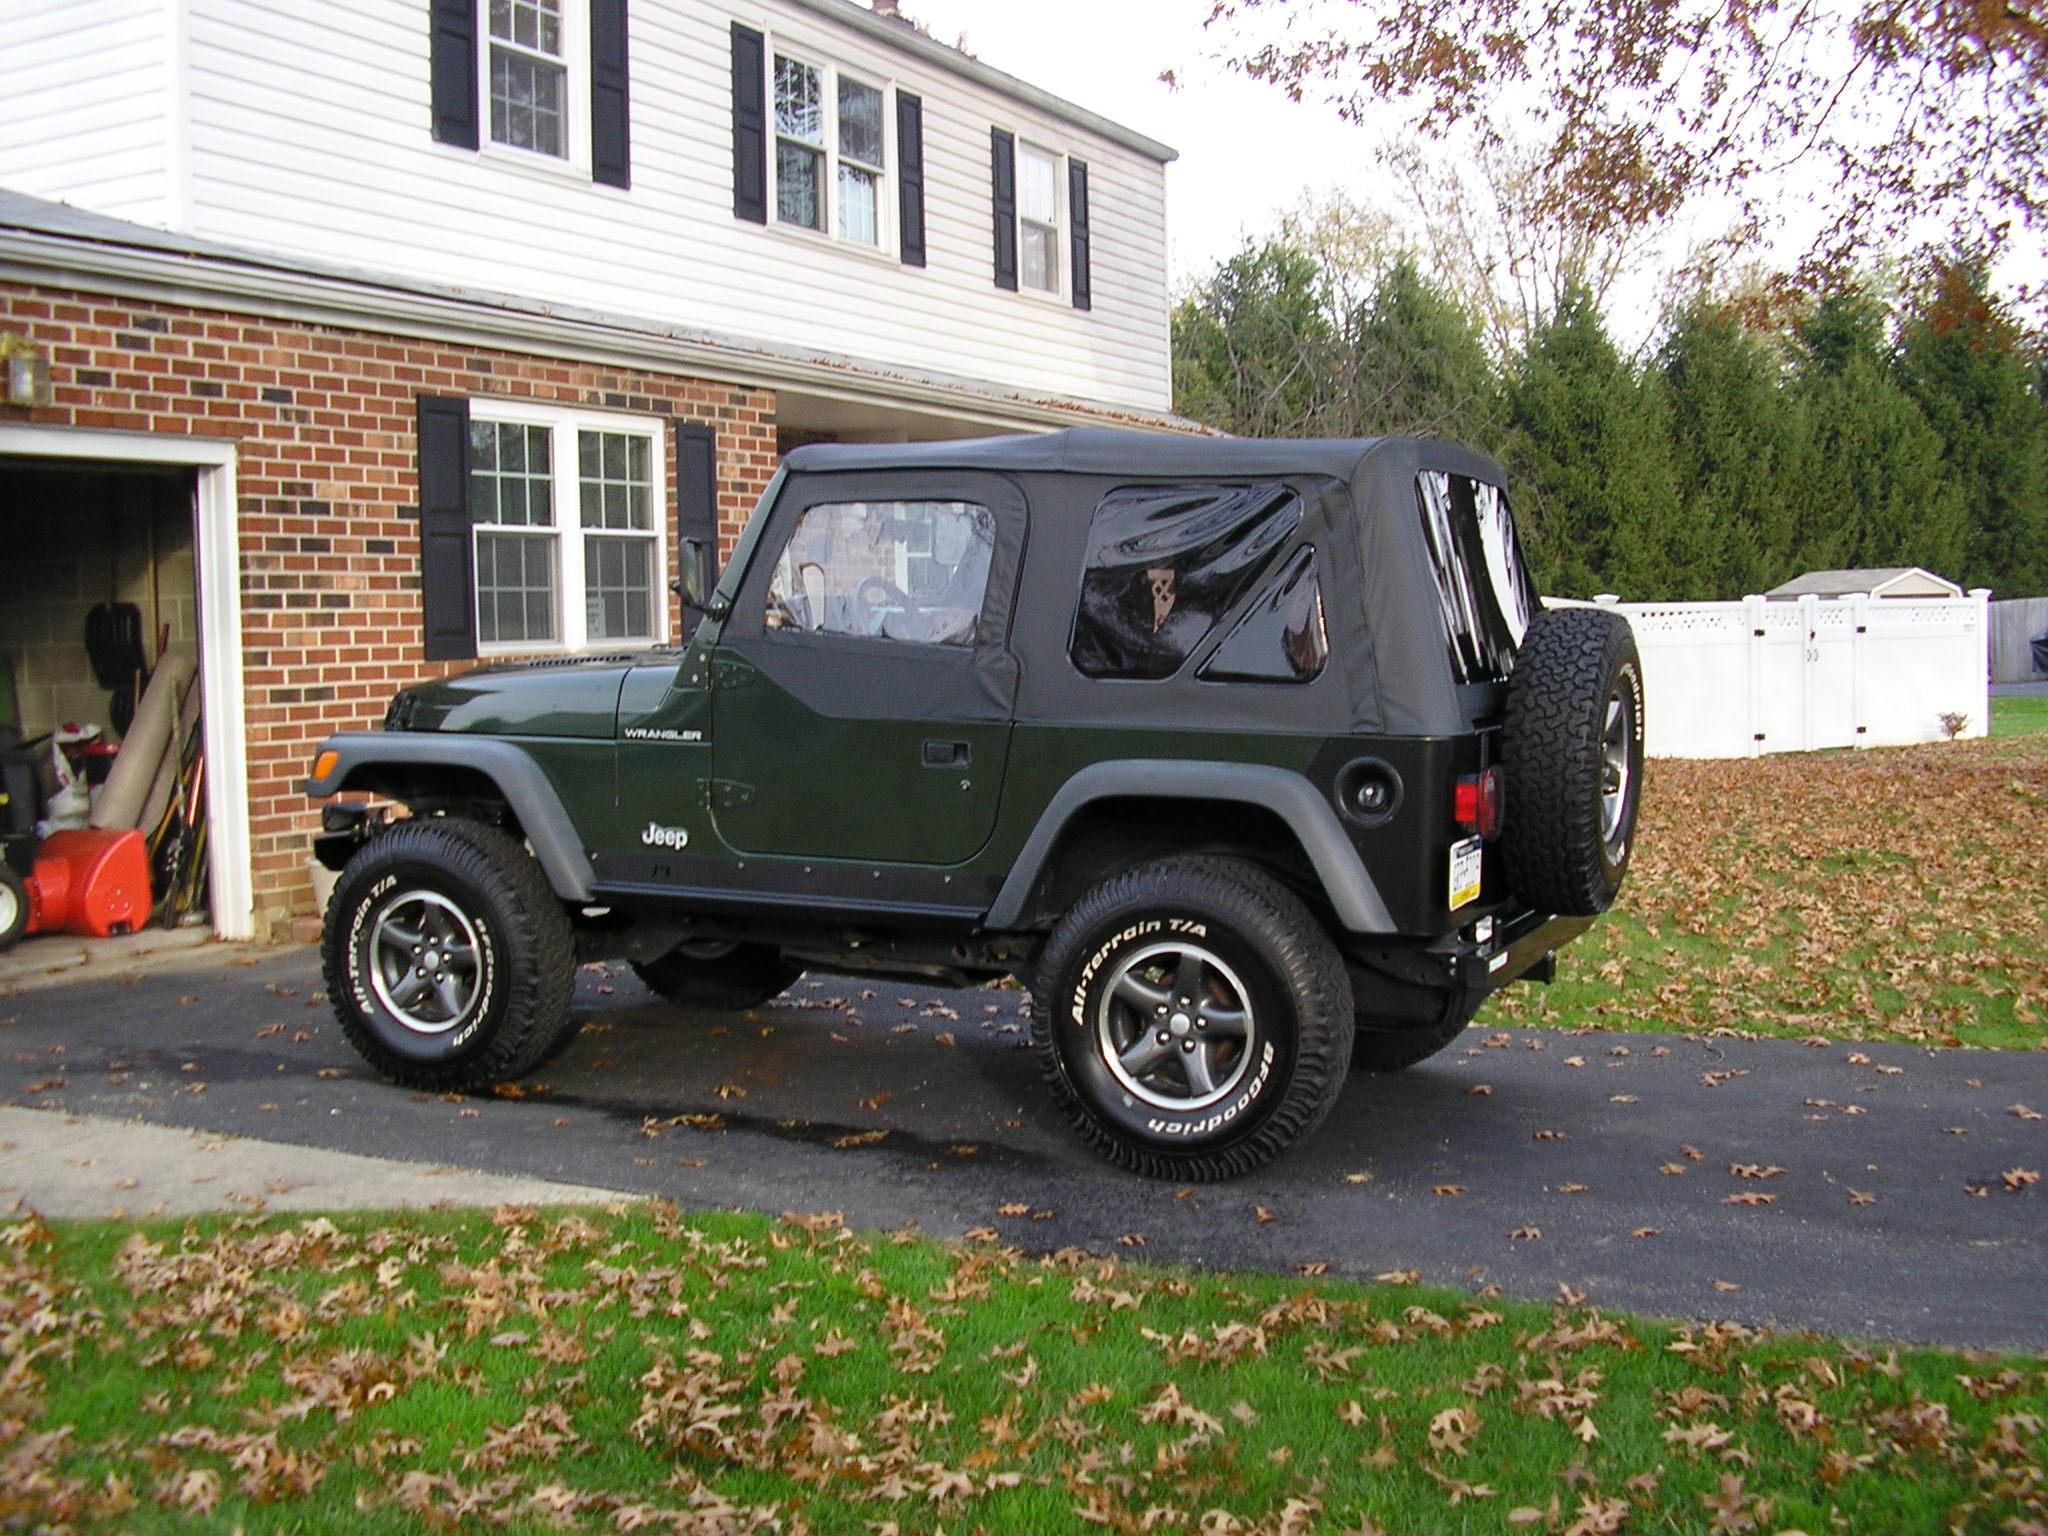 Marks_Jeep_006.JPG